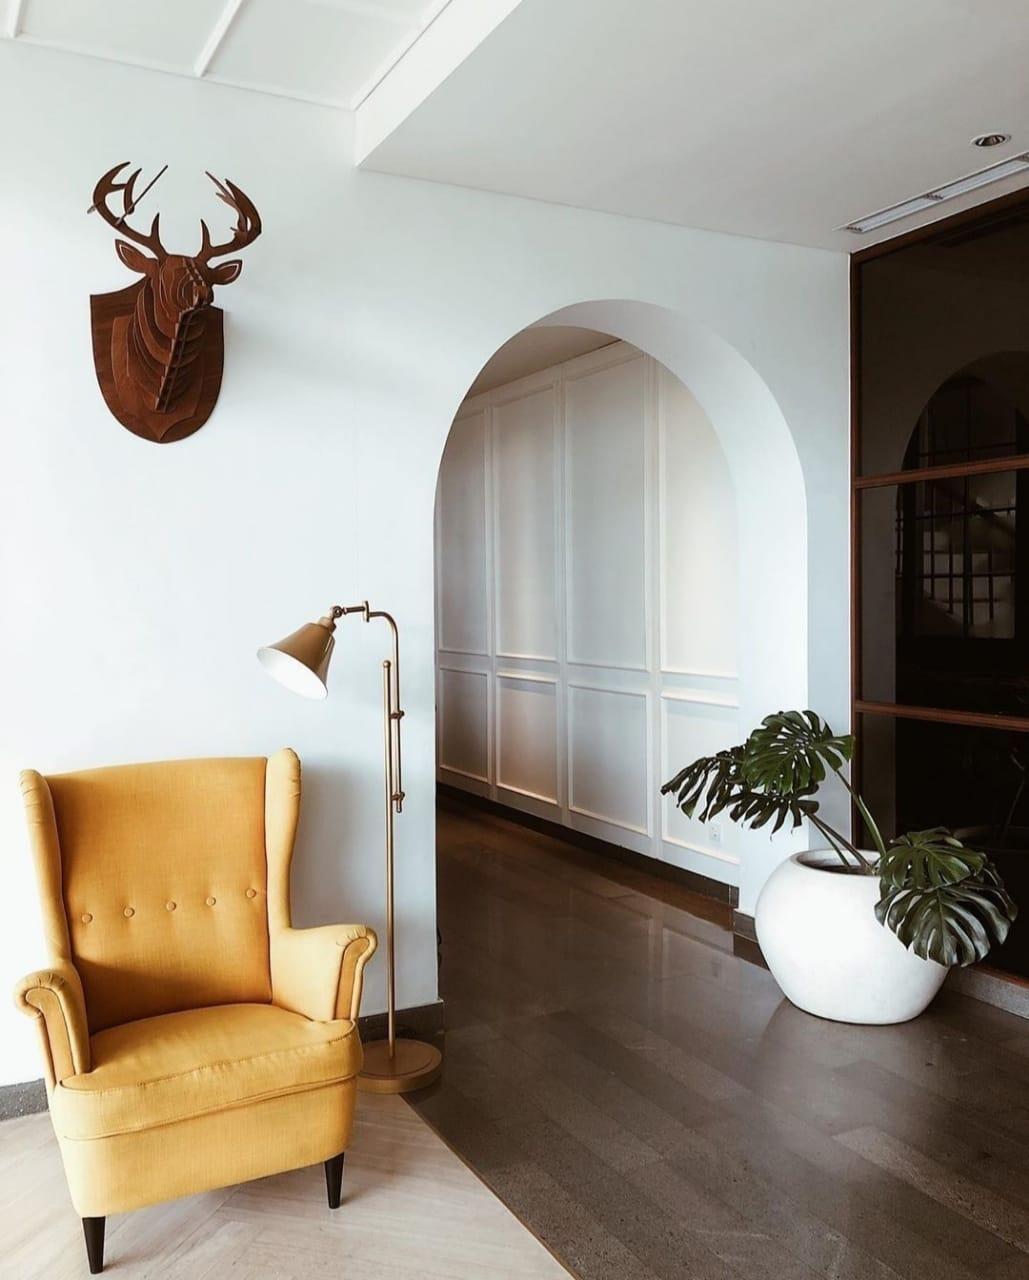 Berkonsep Vintage dan Minimalis, Intip Desain Interior Hotel Kampi Surabaya Yang Instagrammable